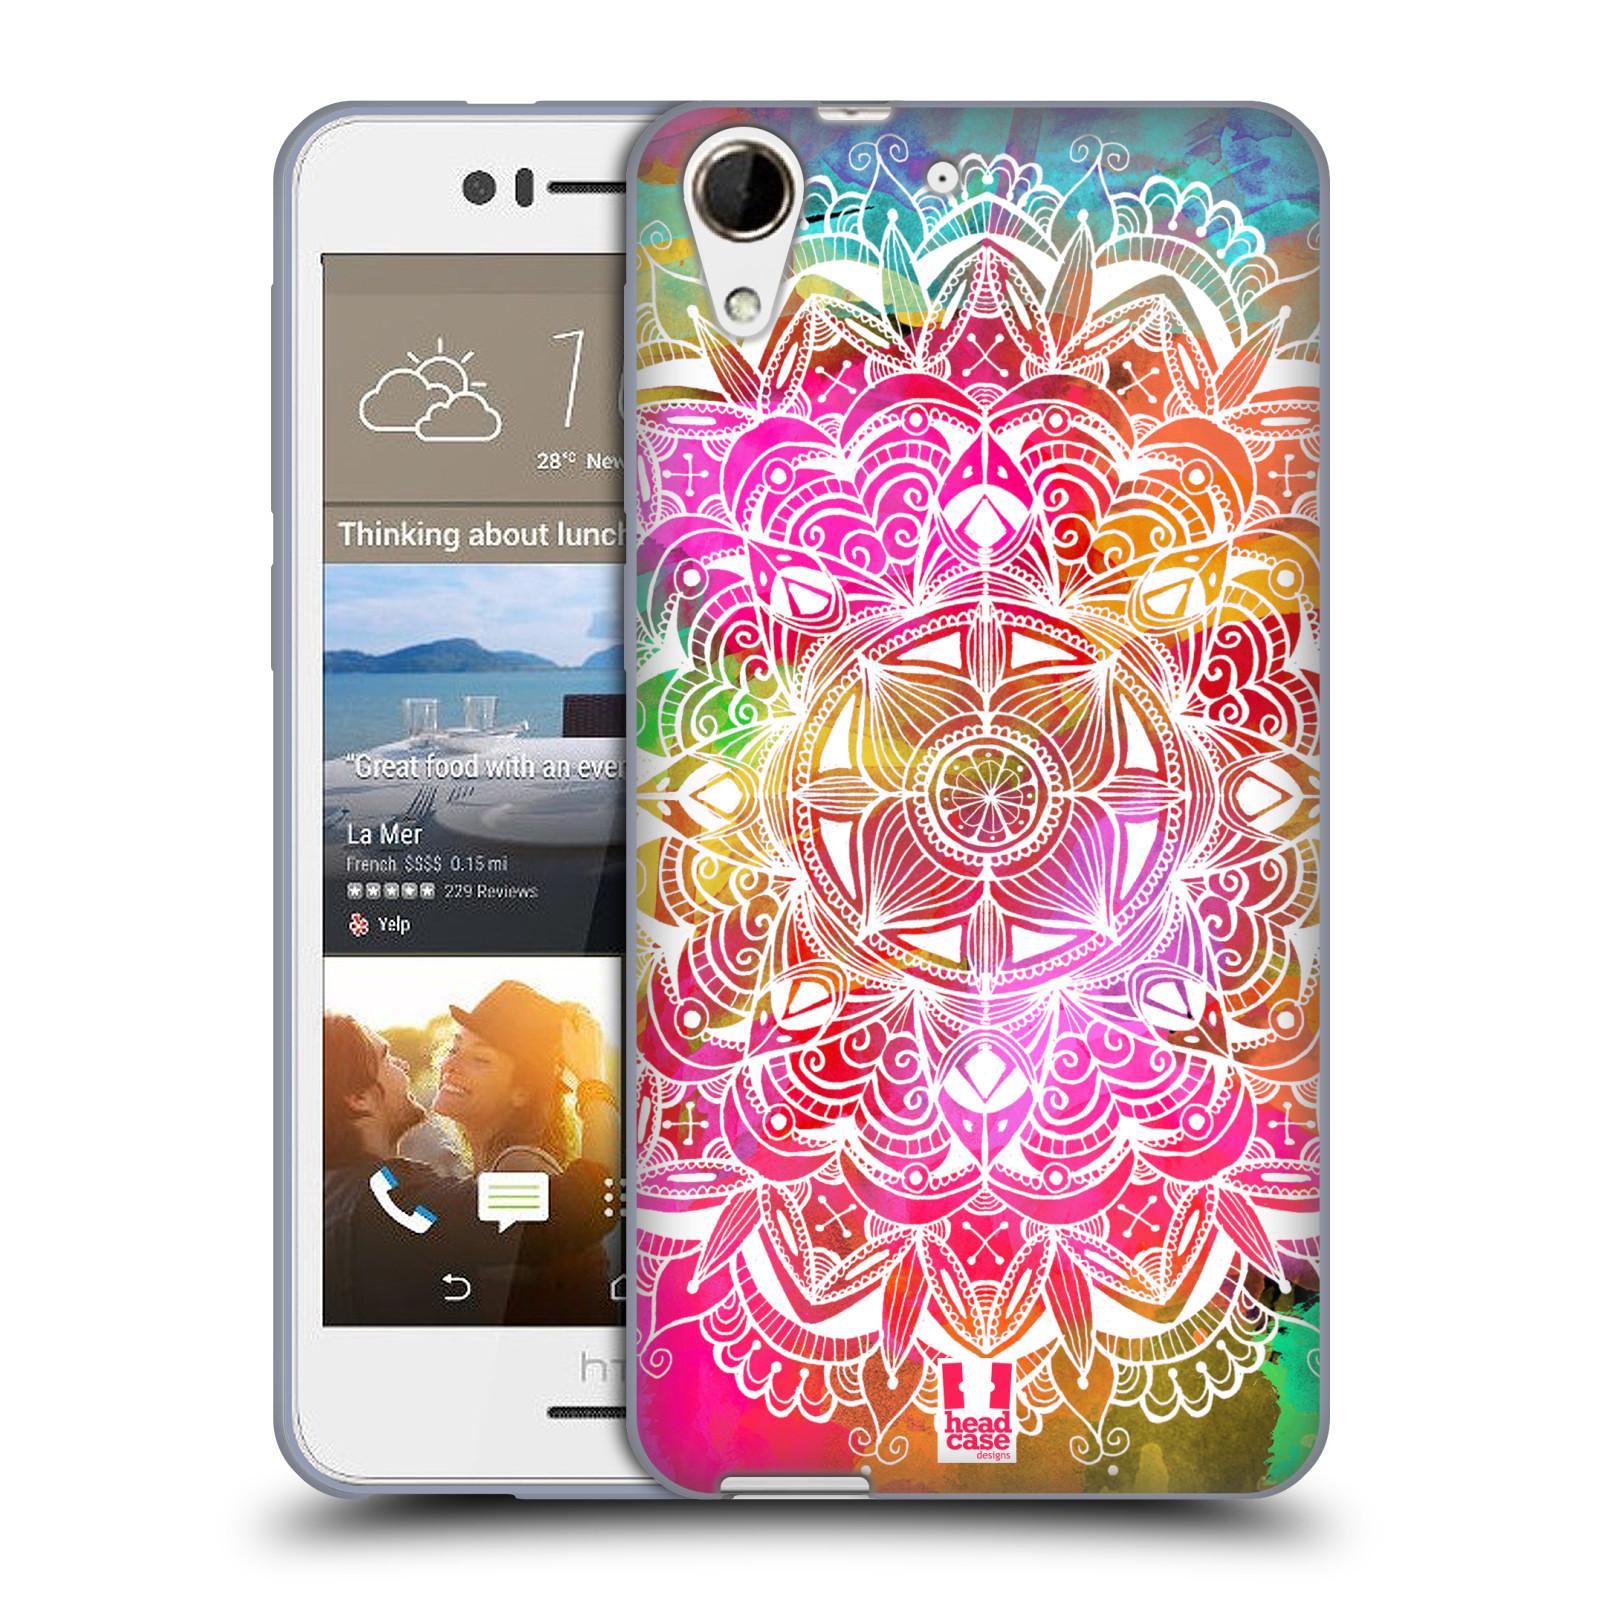 Silikonové pouzdro na mobil HTC Desire 728G Dual SIM HEAD CASE Mandala Doodle Watercolour (Silikonový kryt či obal na mobilní telefon HTC Desire 728 G Dual SIM)